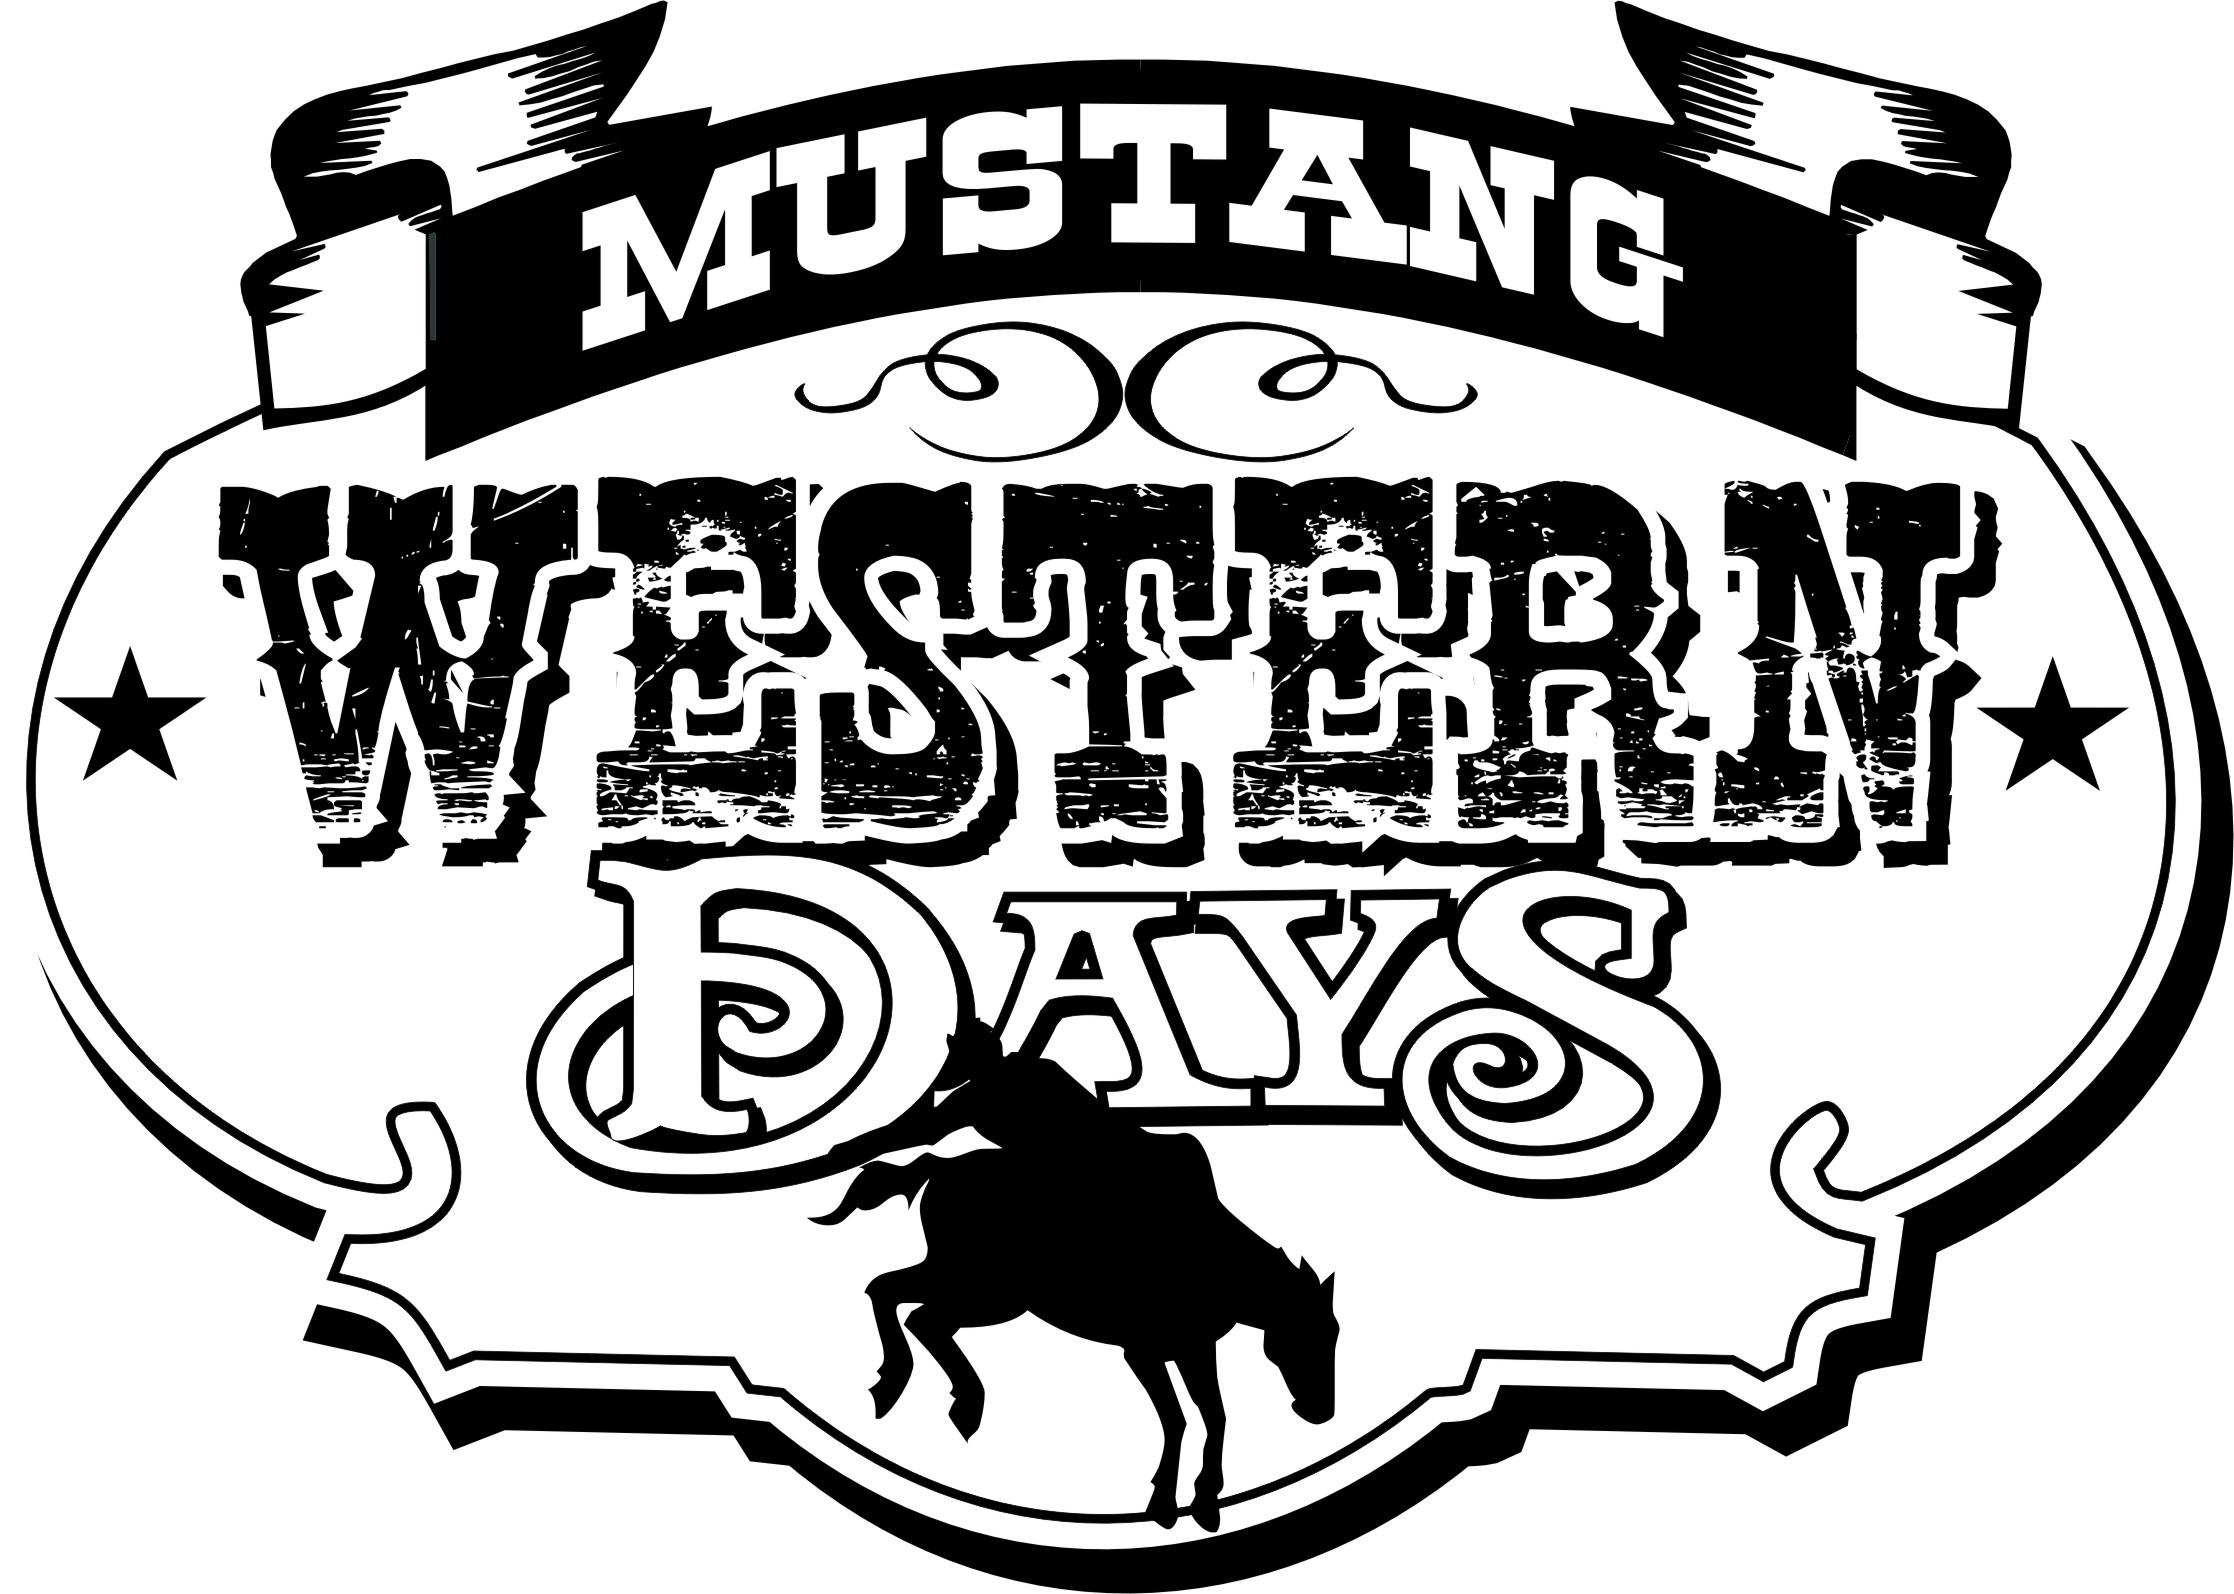 Western belt clipart download Mustang Belt Buckle (2) – Western Days: September 6th – 7th ... download